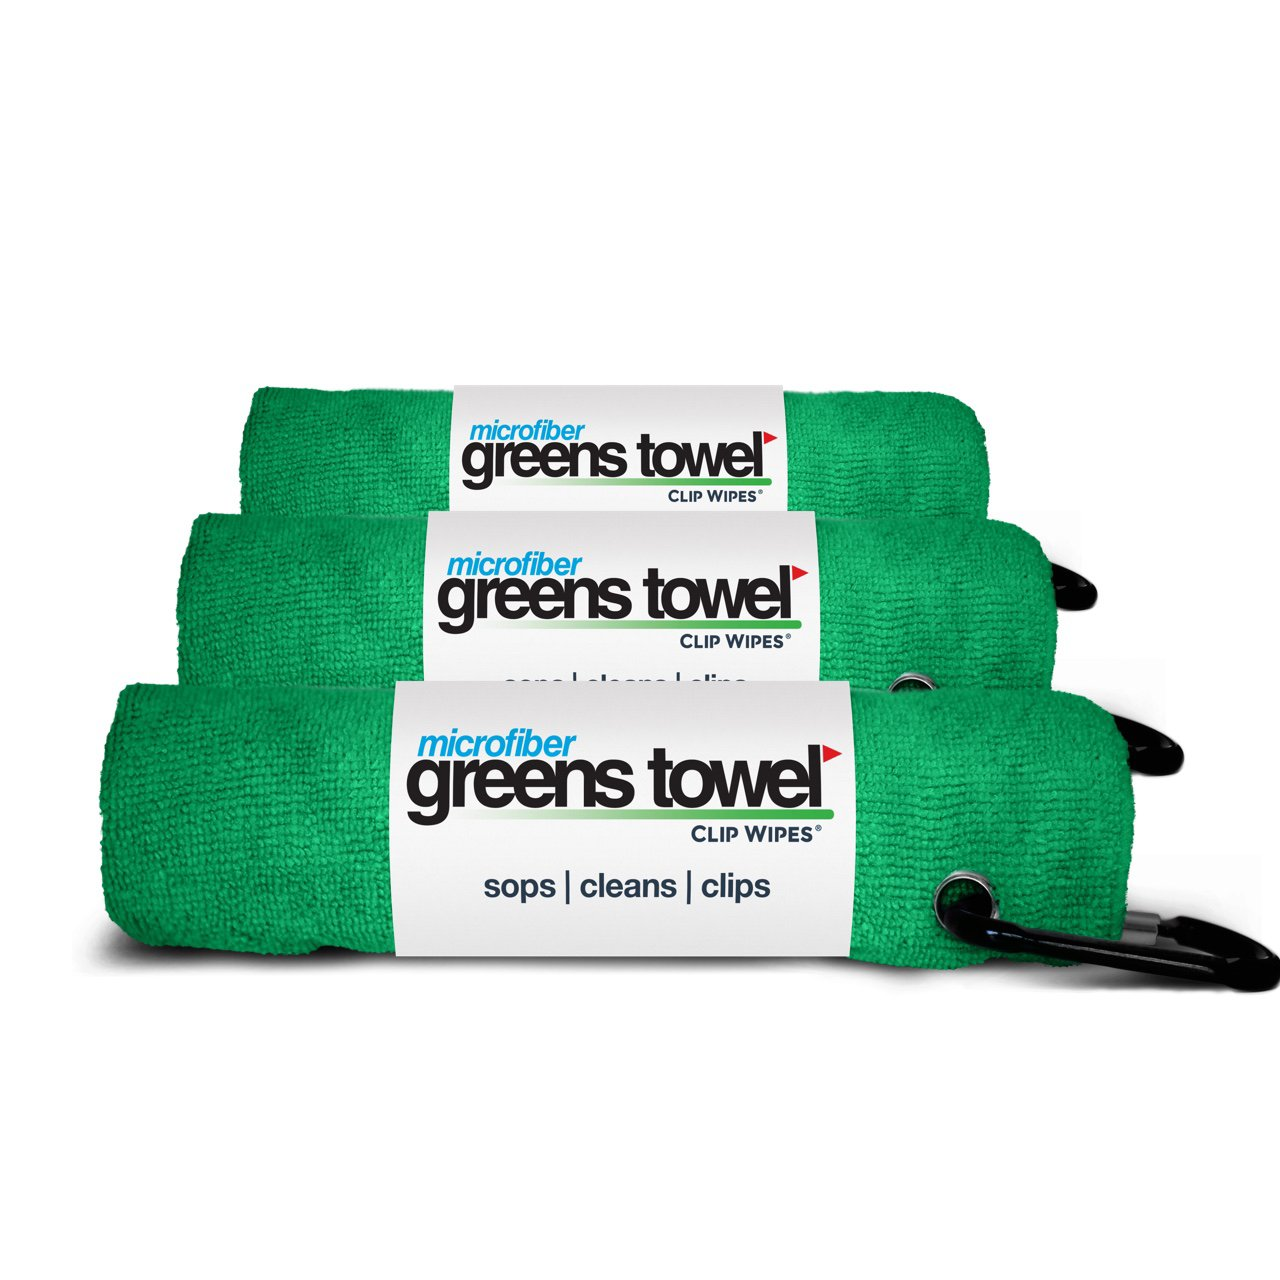 3 Pack of Shamrock Green Microfiber Golf Towels by Greens Towel